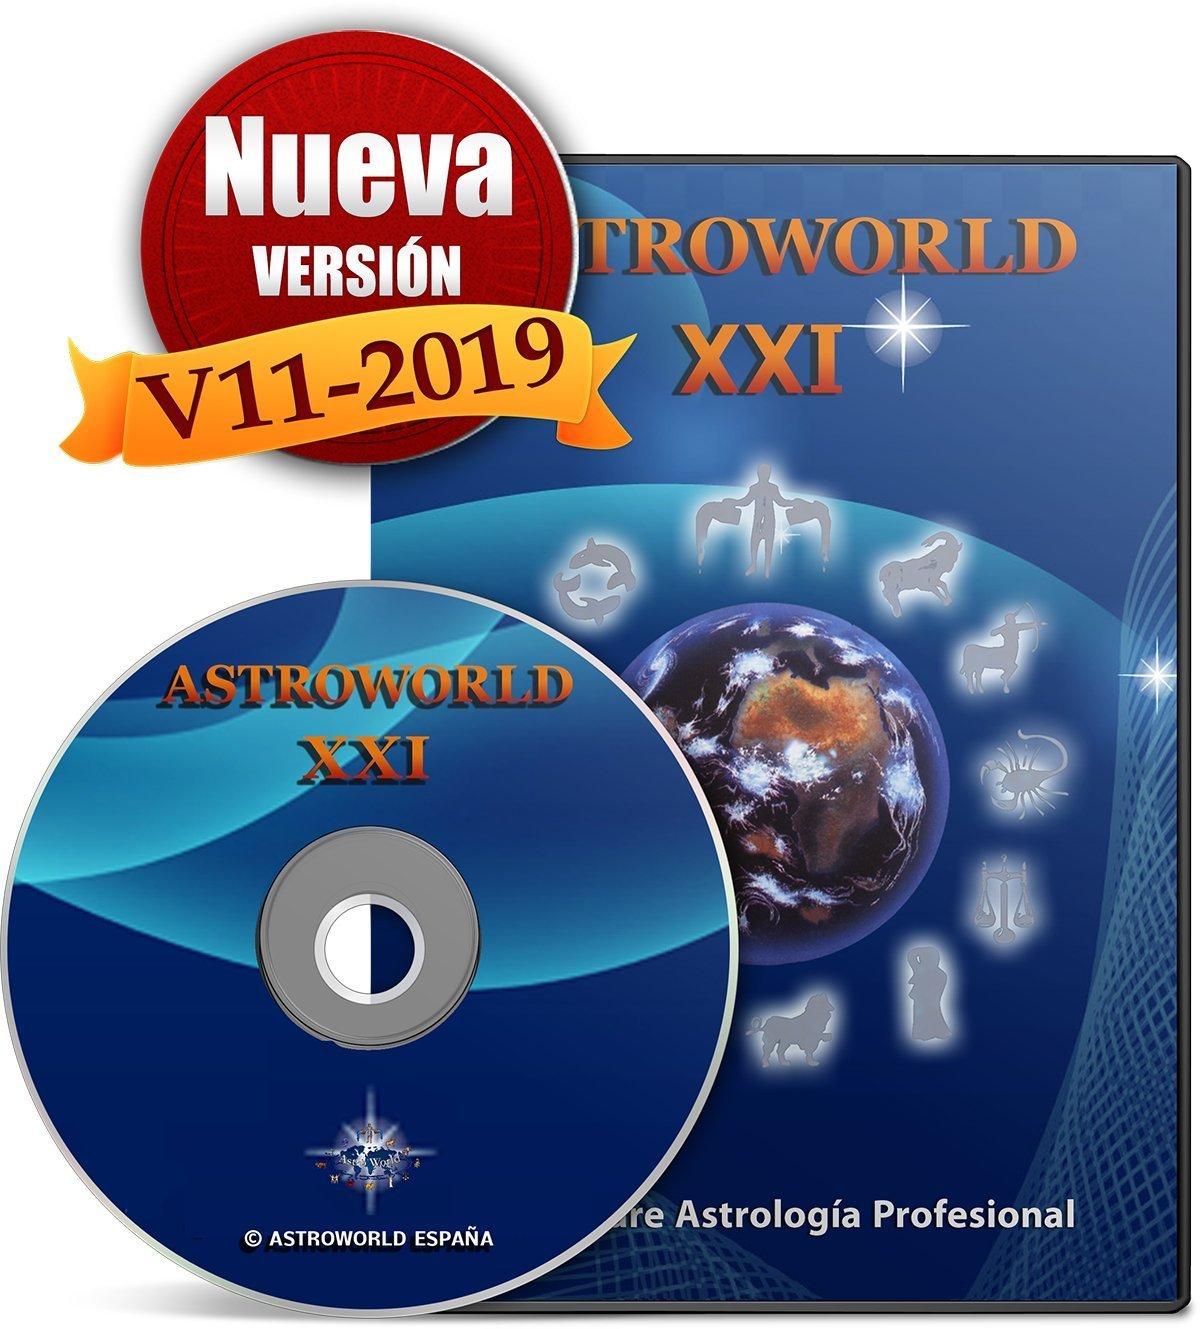 Astroworld XXI Platinum